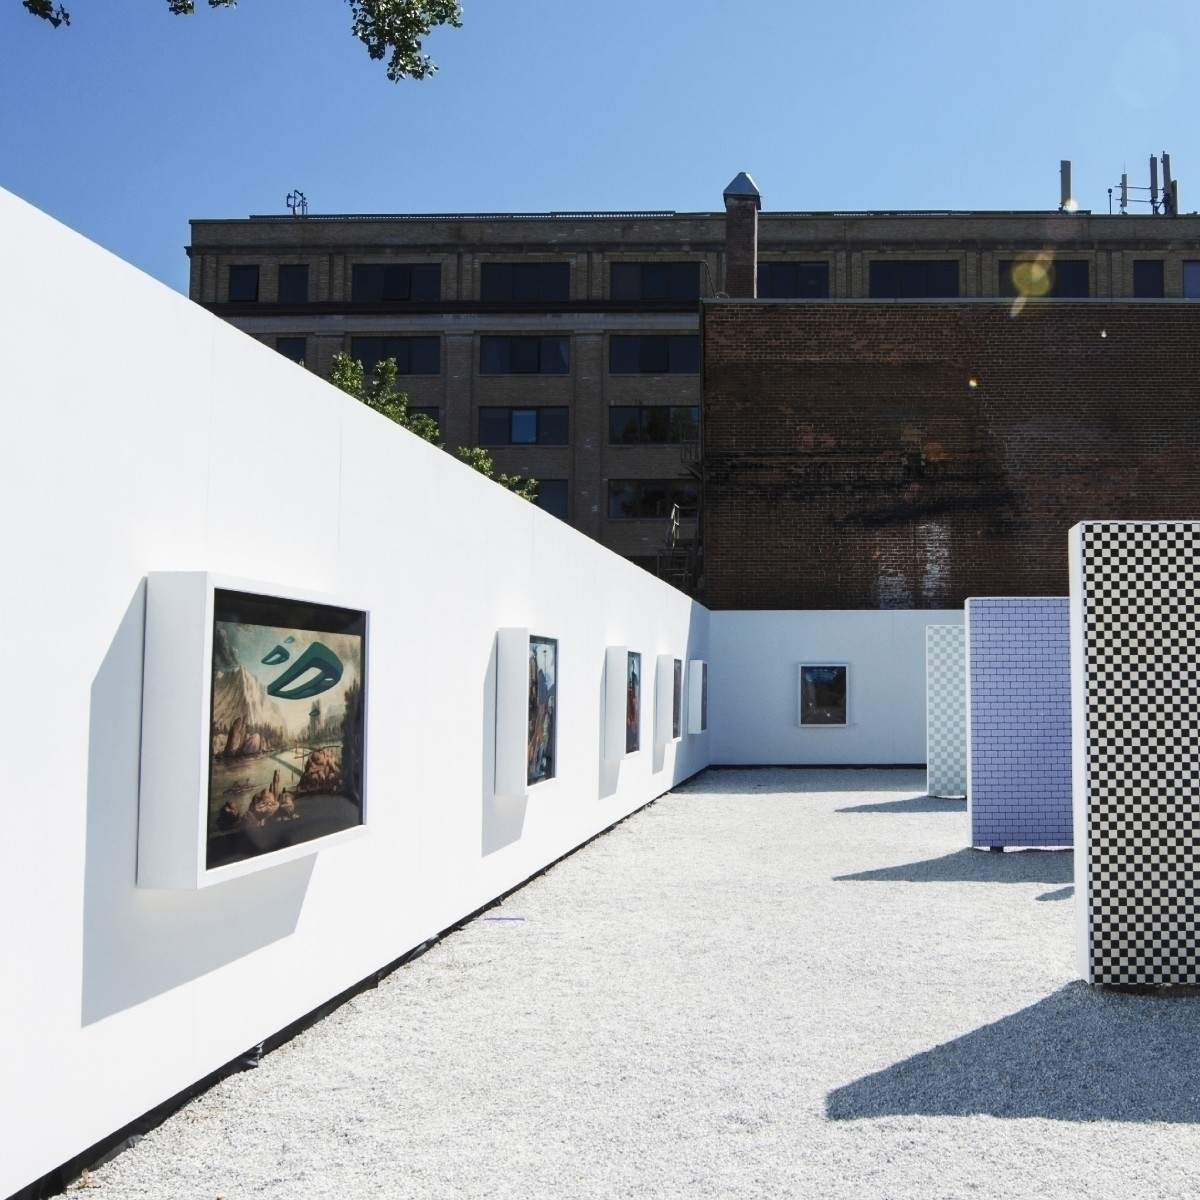 Galerie blanc. 2018 exhibit fea - alexandreberthiaume | ello